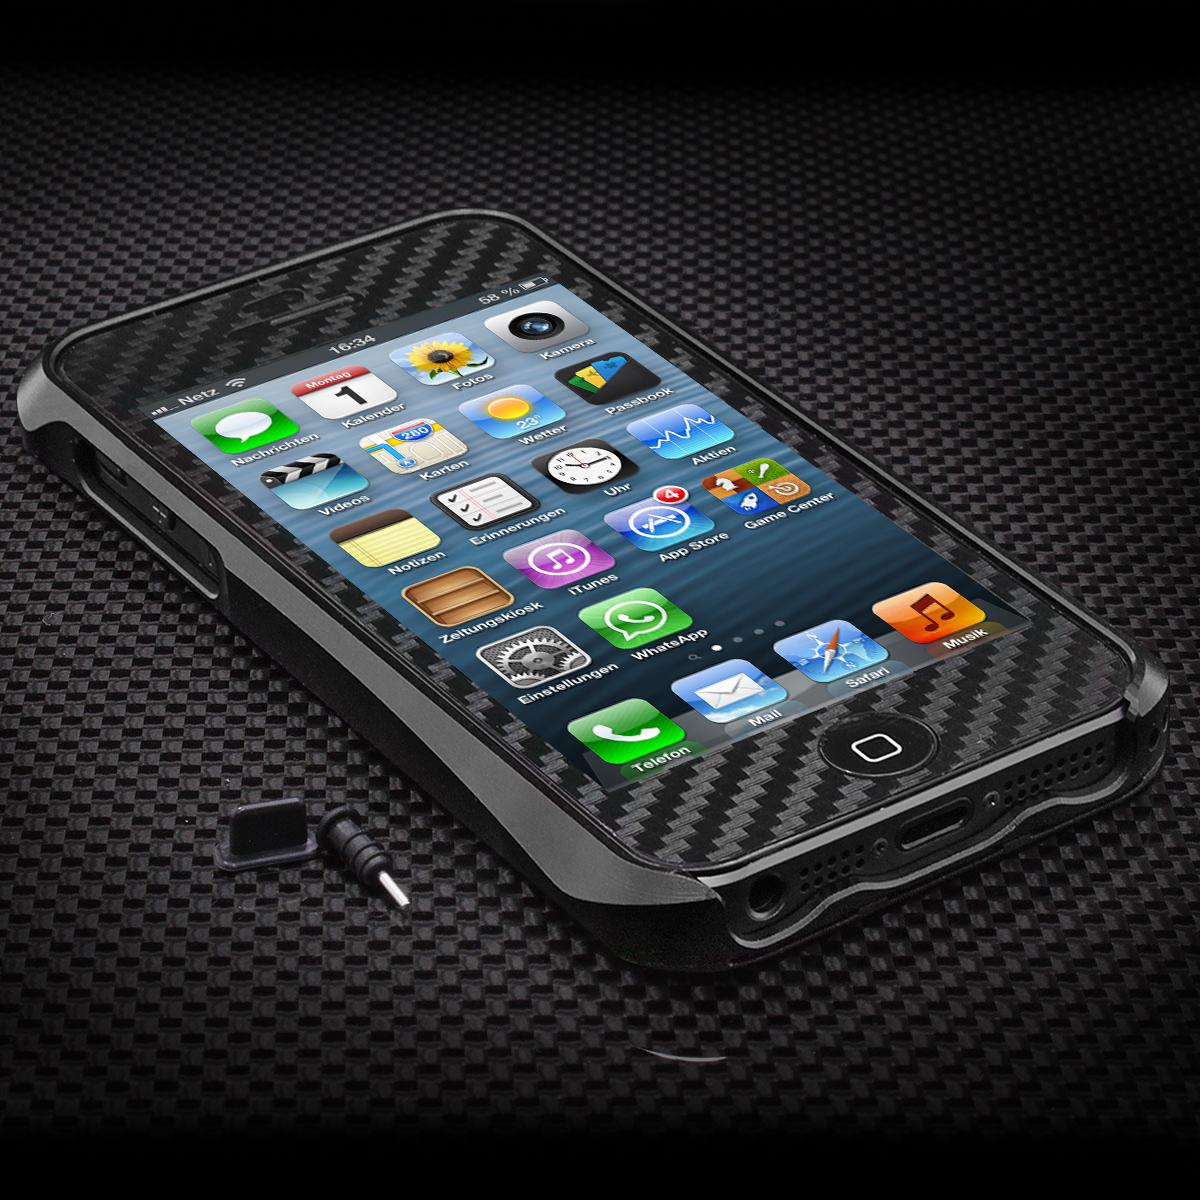 neu iphone 5 5s schutz set aluminium case tasche bumper. Black Bedroom Furniture Sets. Home Design Ideas